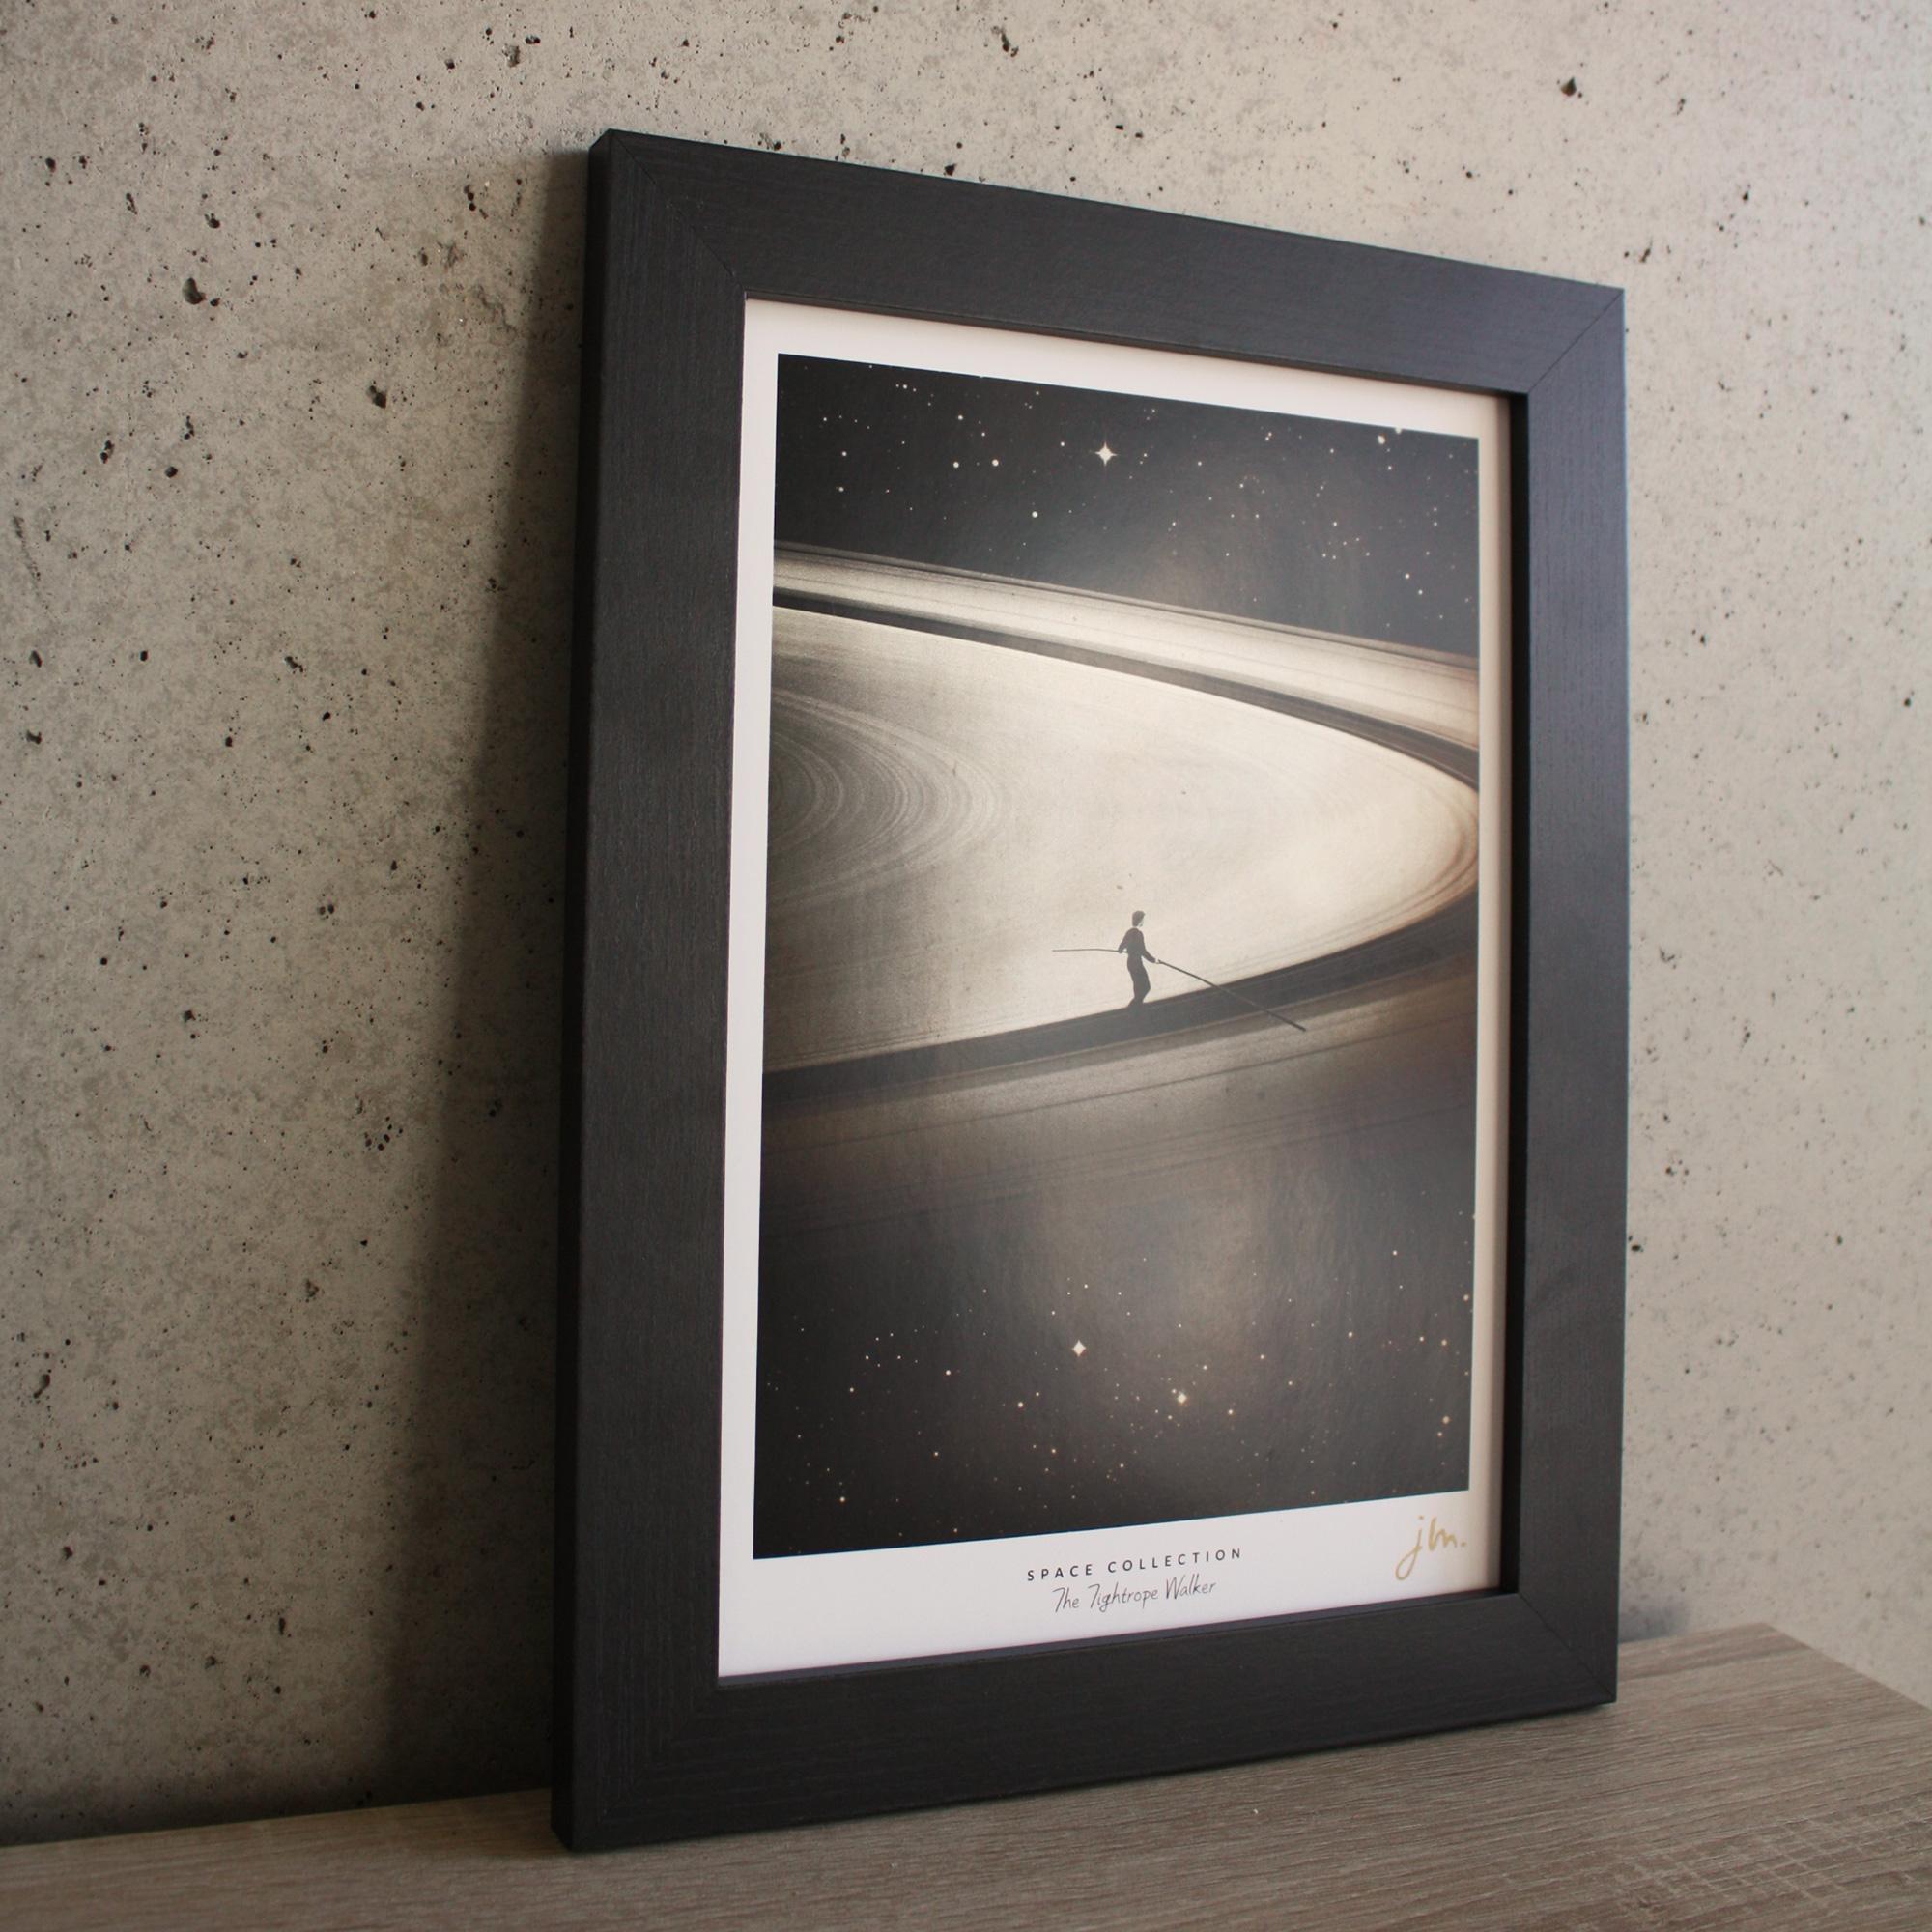 Affiche Fine Art The Tightrope Walker - Edition Silver